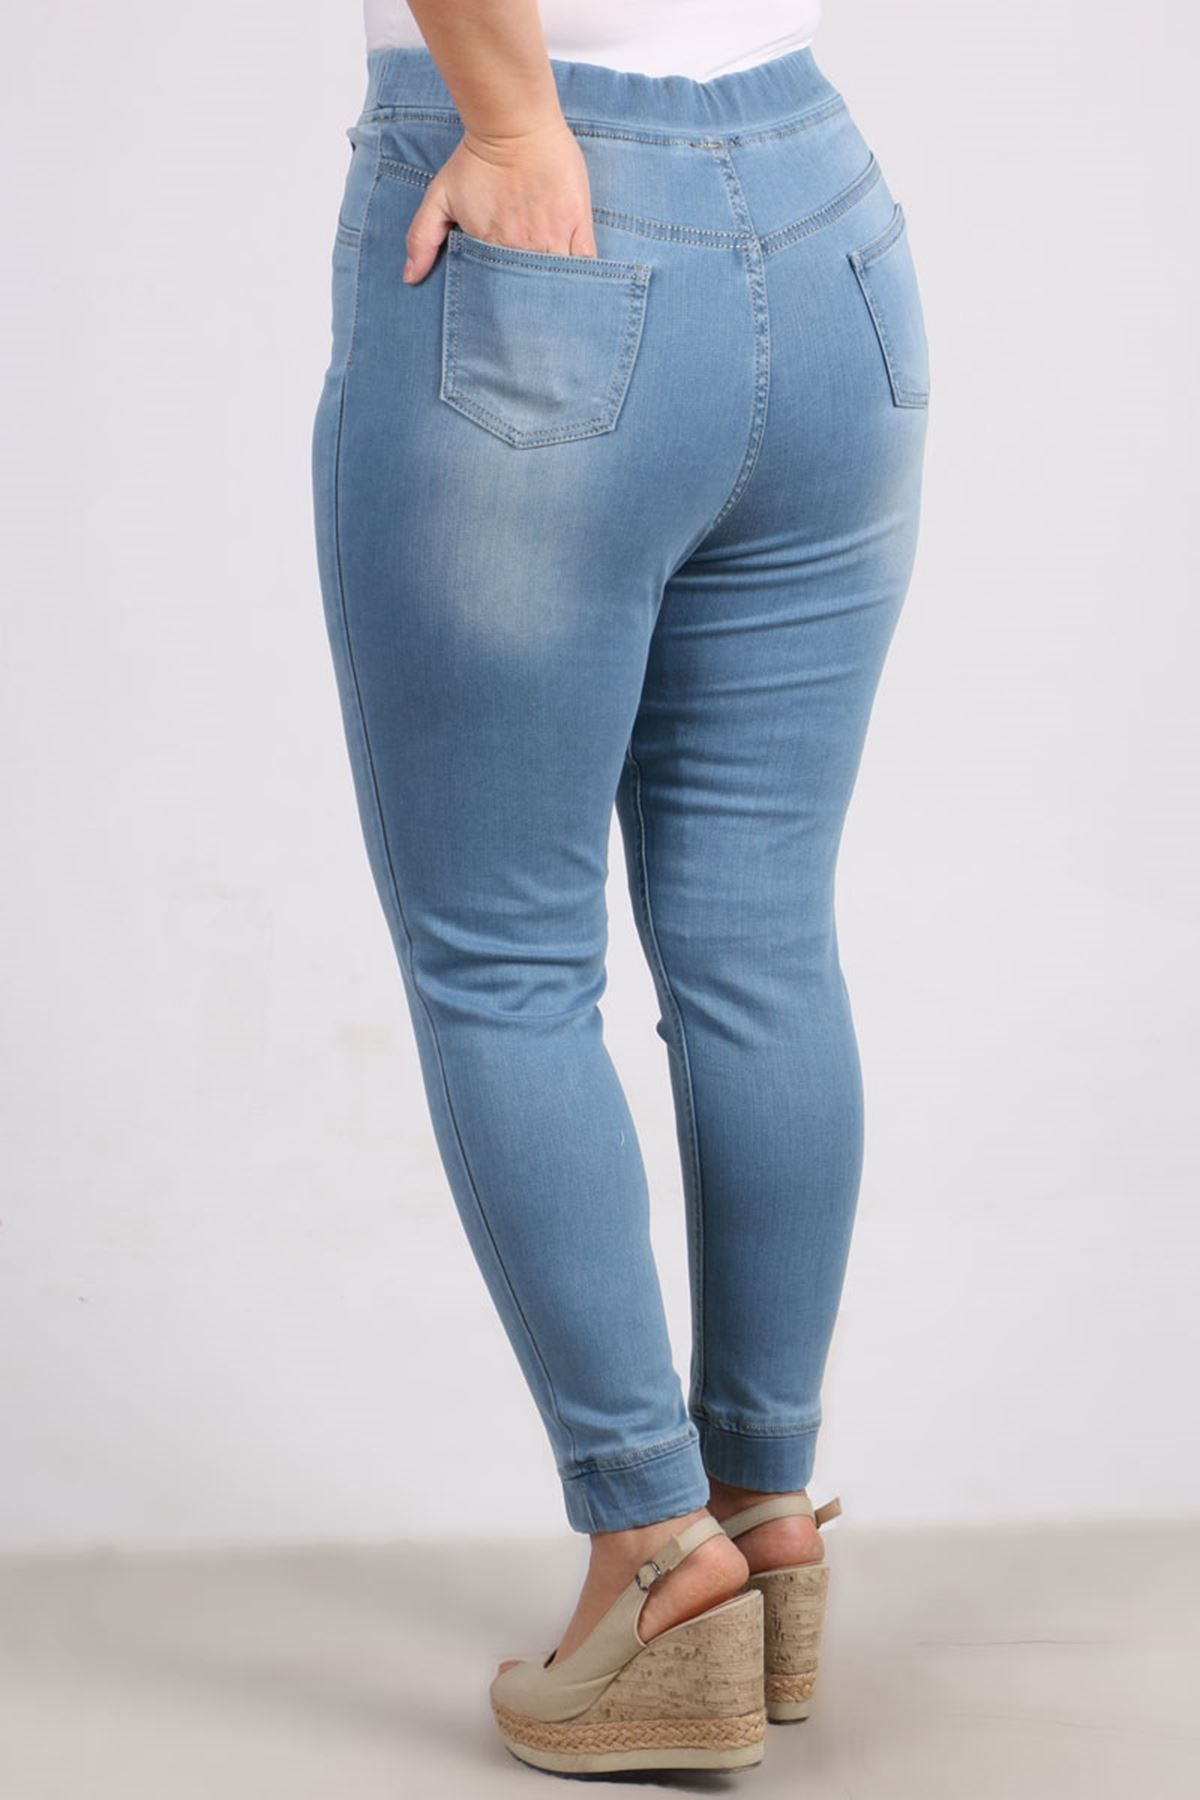 9139-1 Büyük Beden Beli Lastikli Taşlanmış Dar Paça Kot Pantalon-Buz Mavi